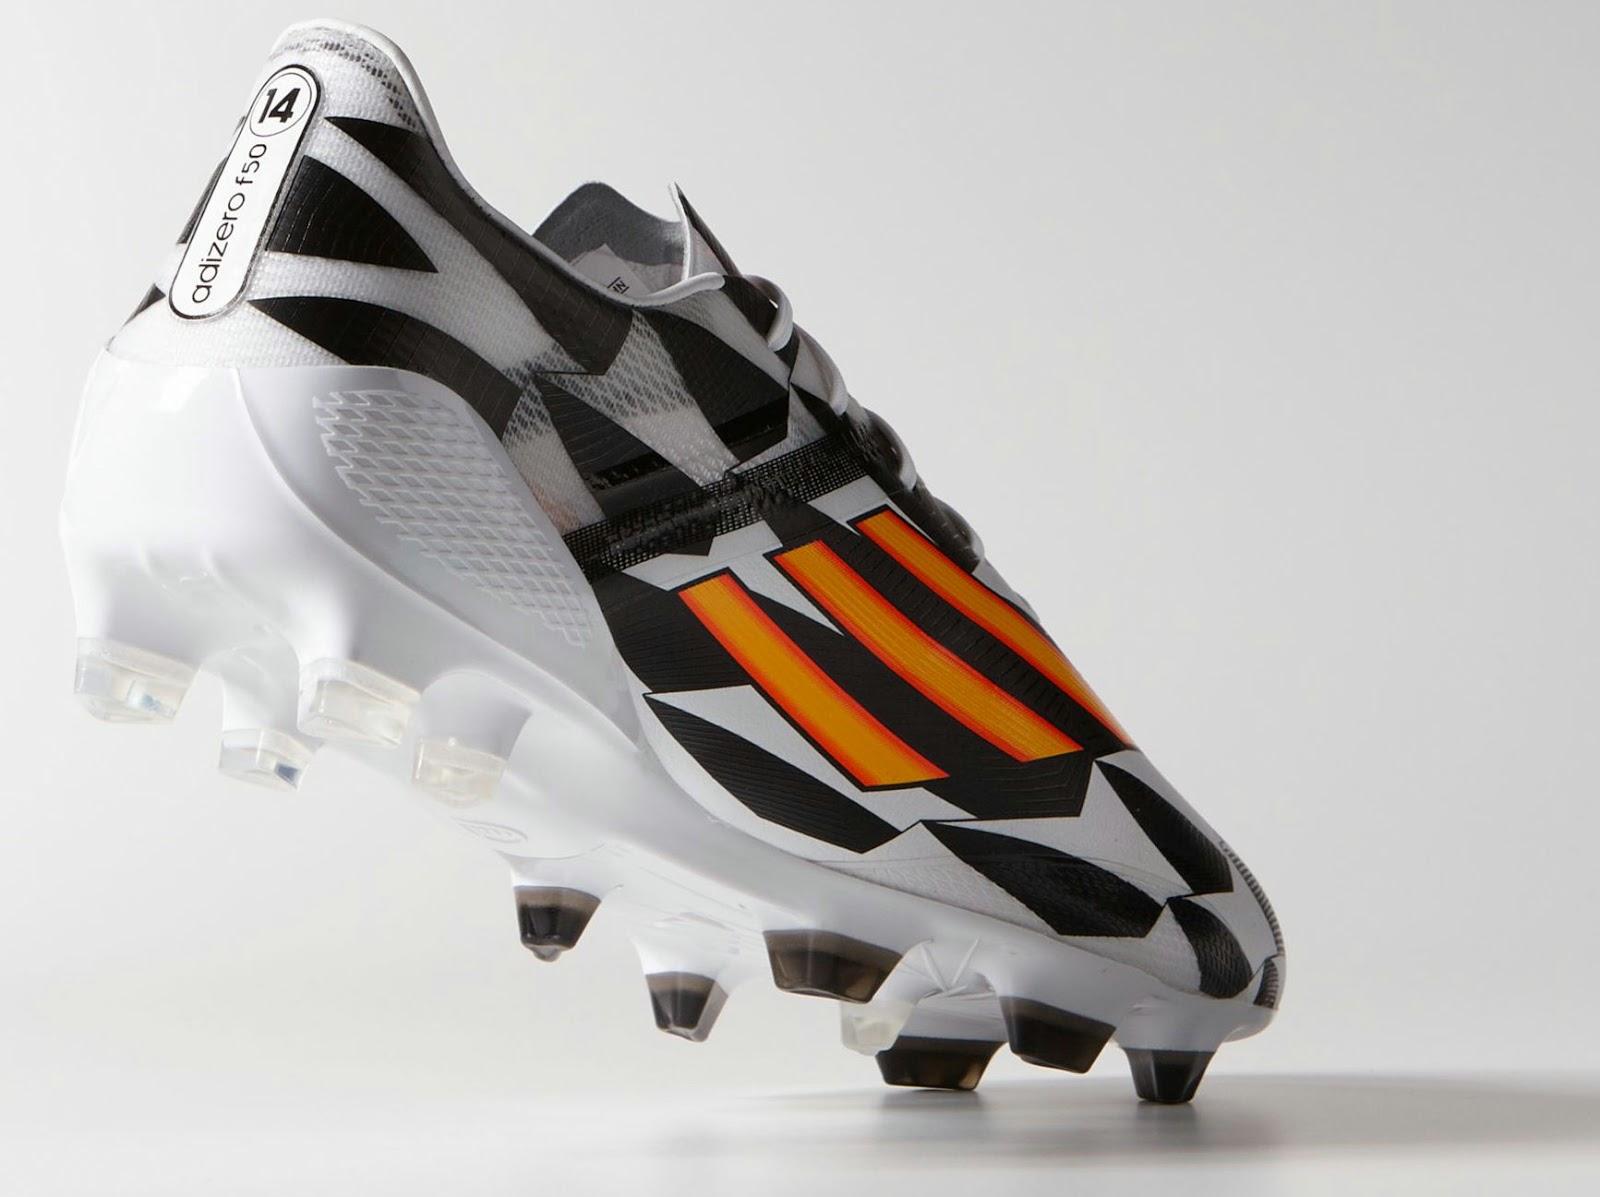 adidas adizero f50 2014 world cup battle pack boot